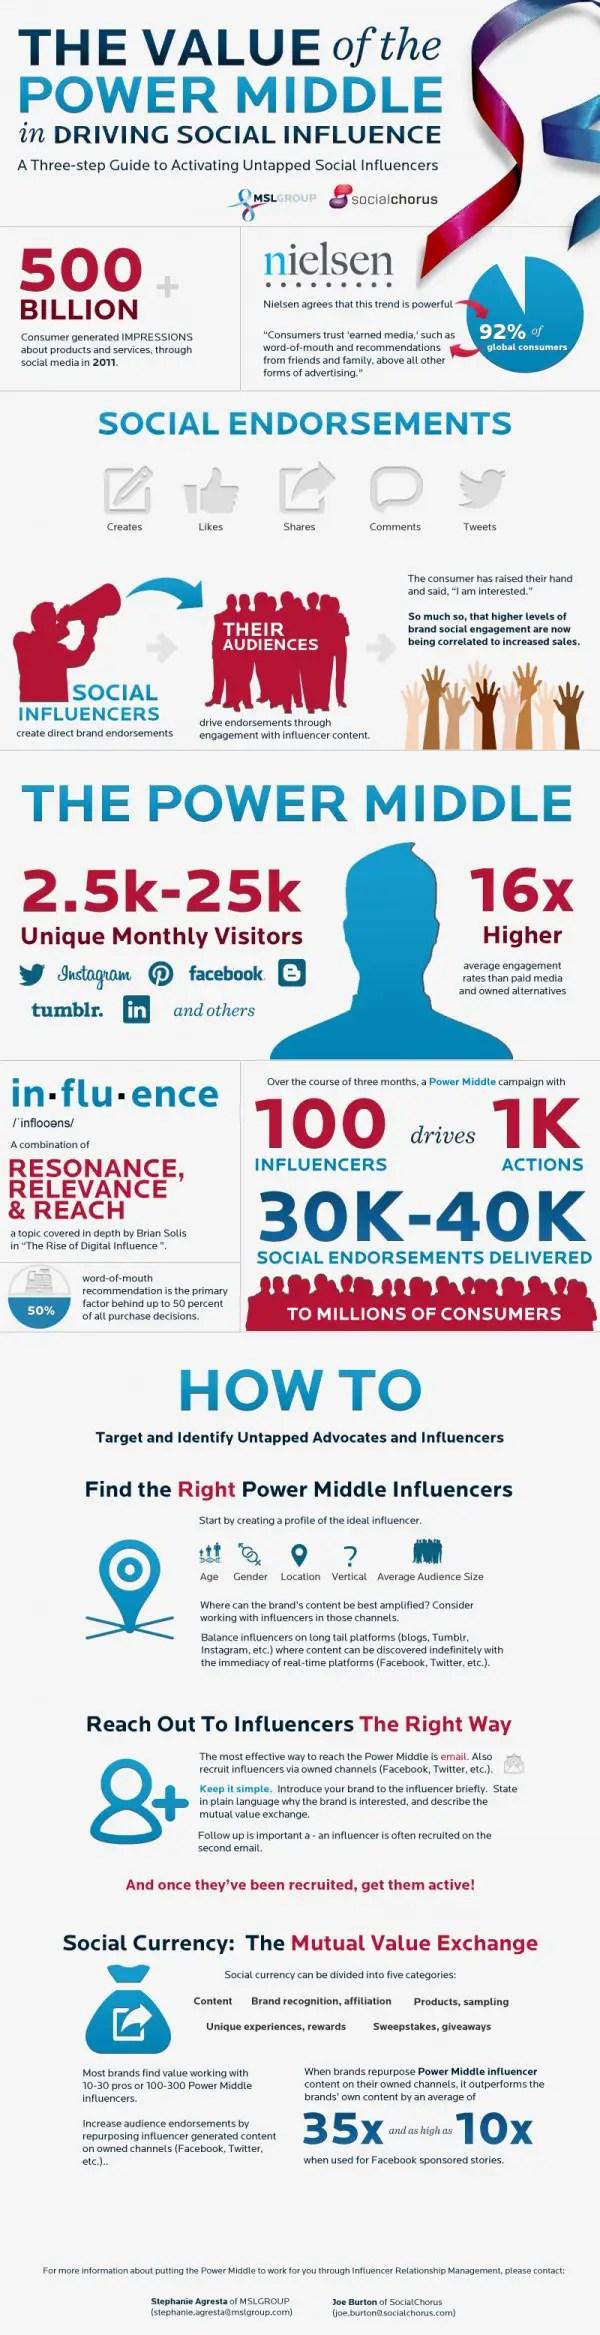 Social Media Influencers - We are Social Media